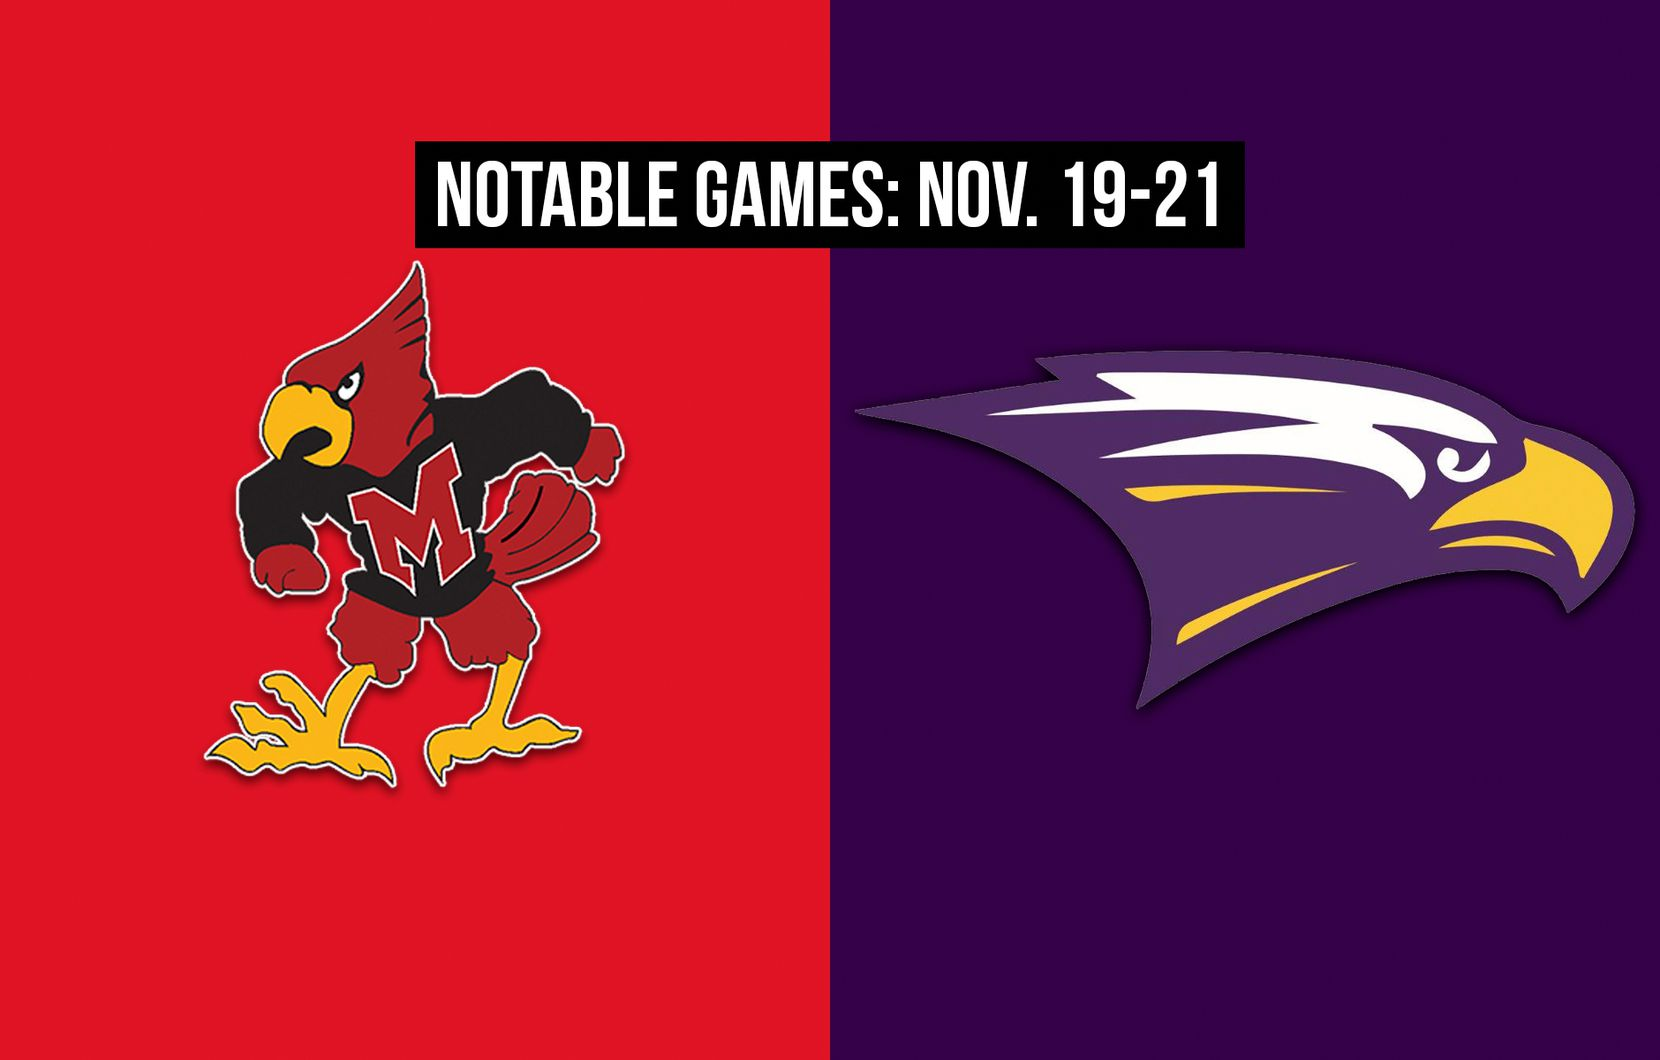 Notable games for the week of Nov. 19-21 of the 2020 season: Irving MacArthur vs. Richardson.